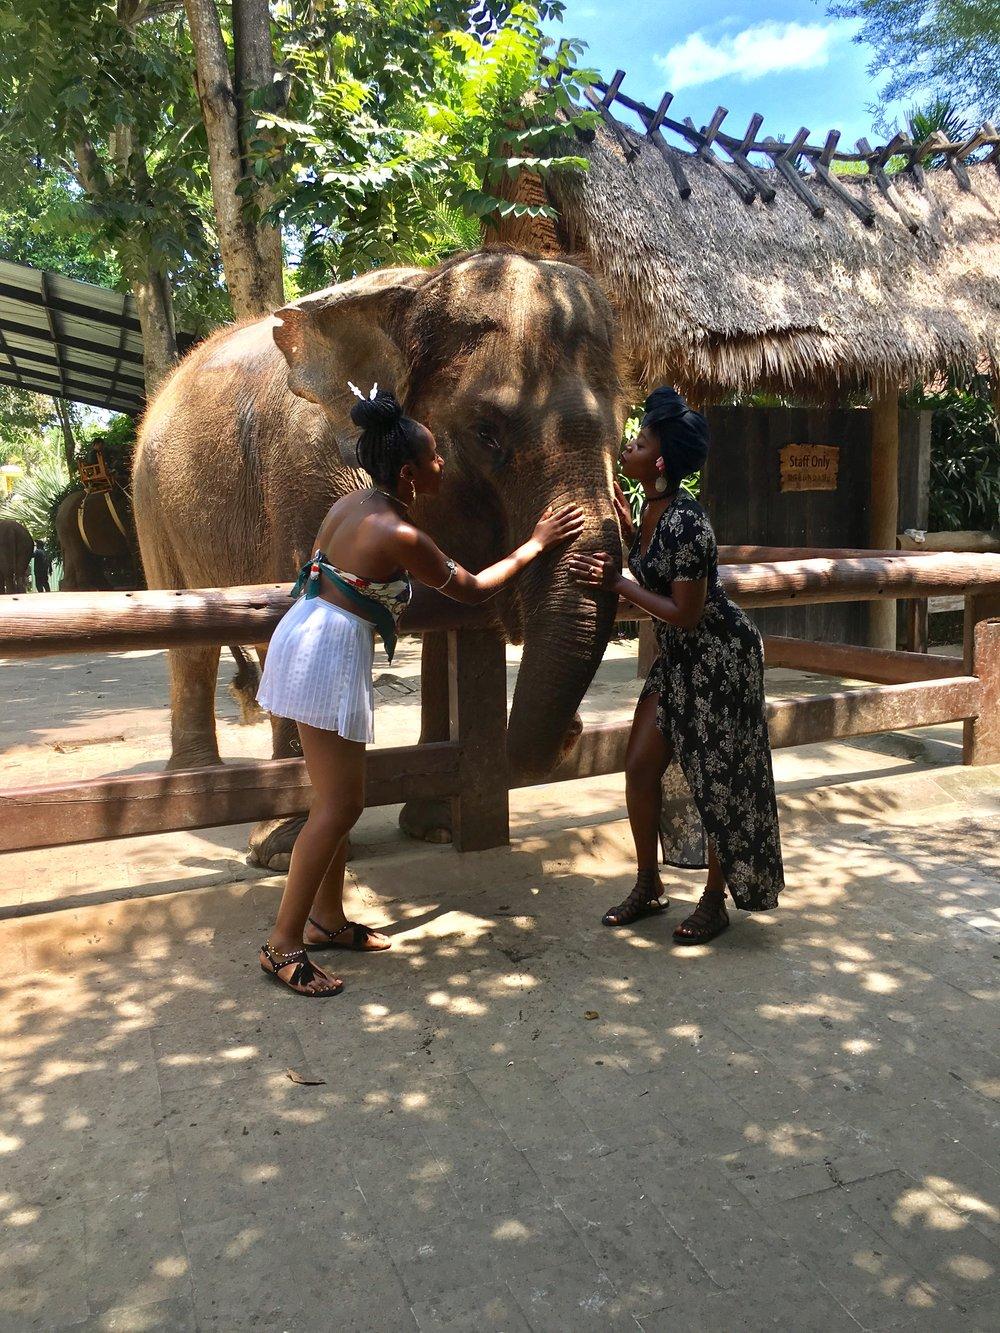 IMG_5174.jpgtherevgoesagain-BaliBliss